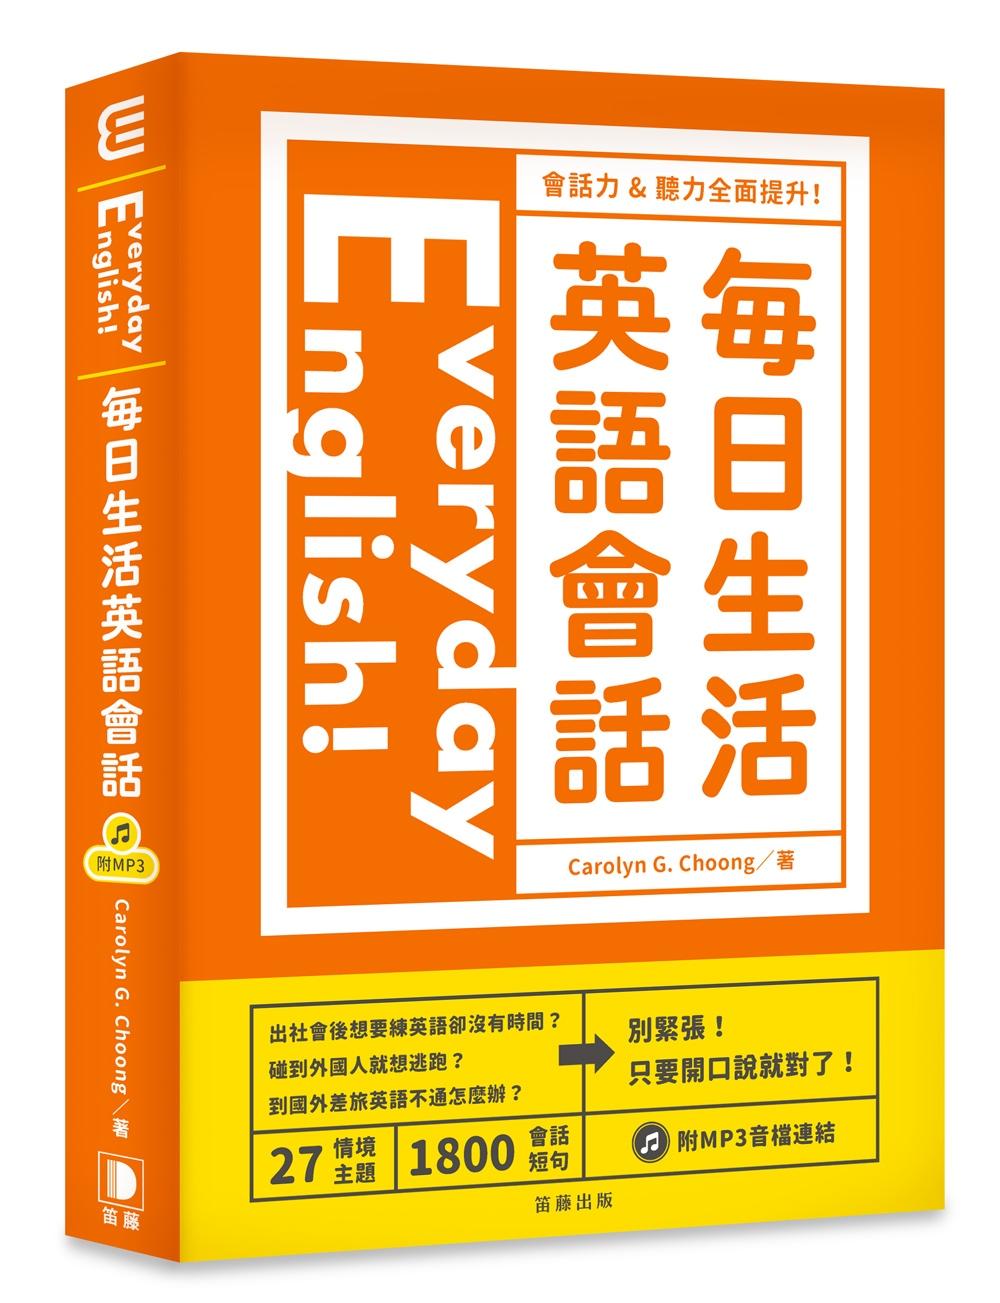 Everyday English ! 每日生活英語會話(附MP3 音檔連結)